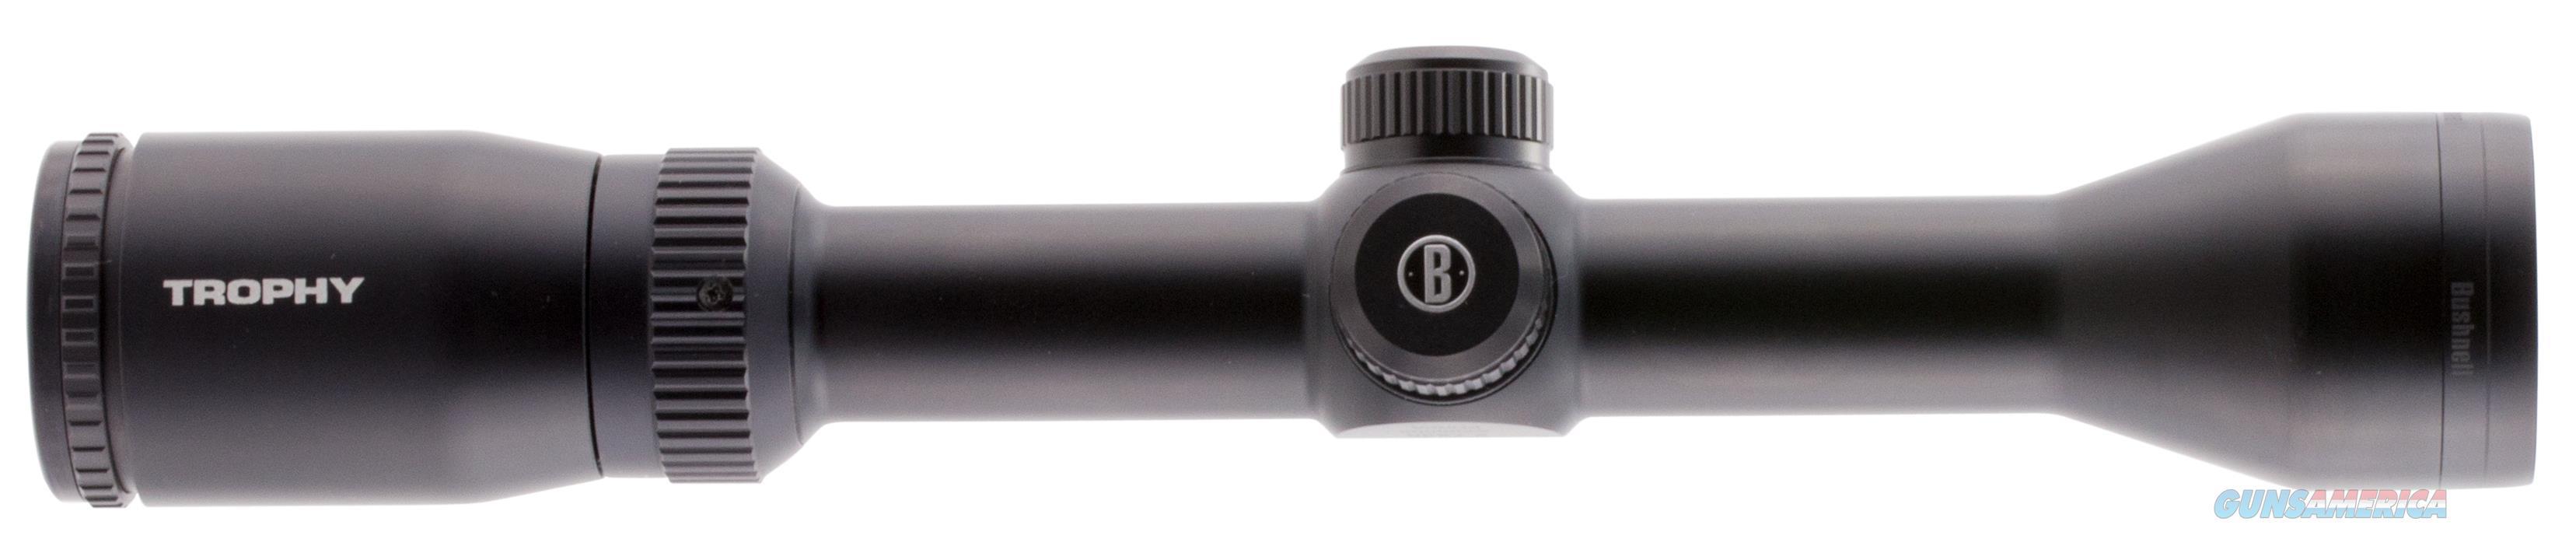 Bushnell 2-7X36 Trophy Matte Multi-X 752736  Non-Guns > Scopes/Mounts/Rings & Optics > Rifle Scopes > Variable Focal Length